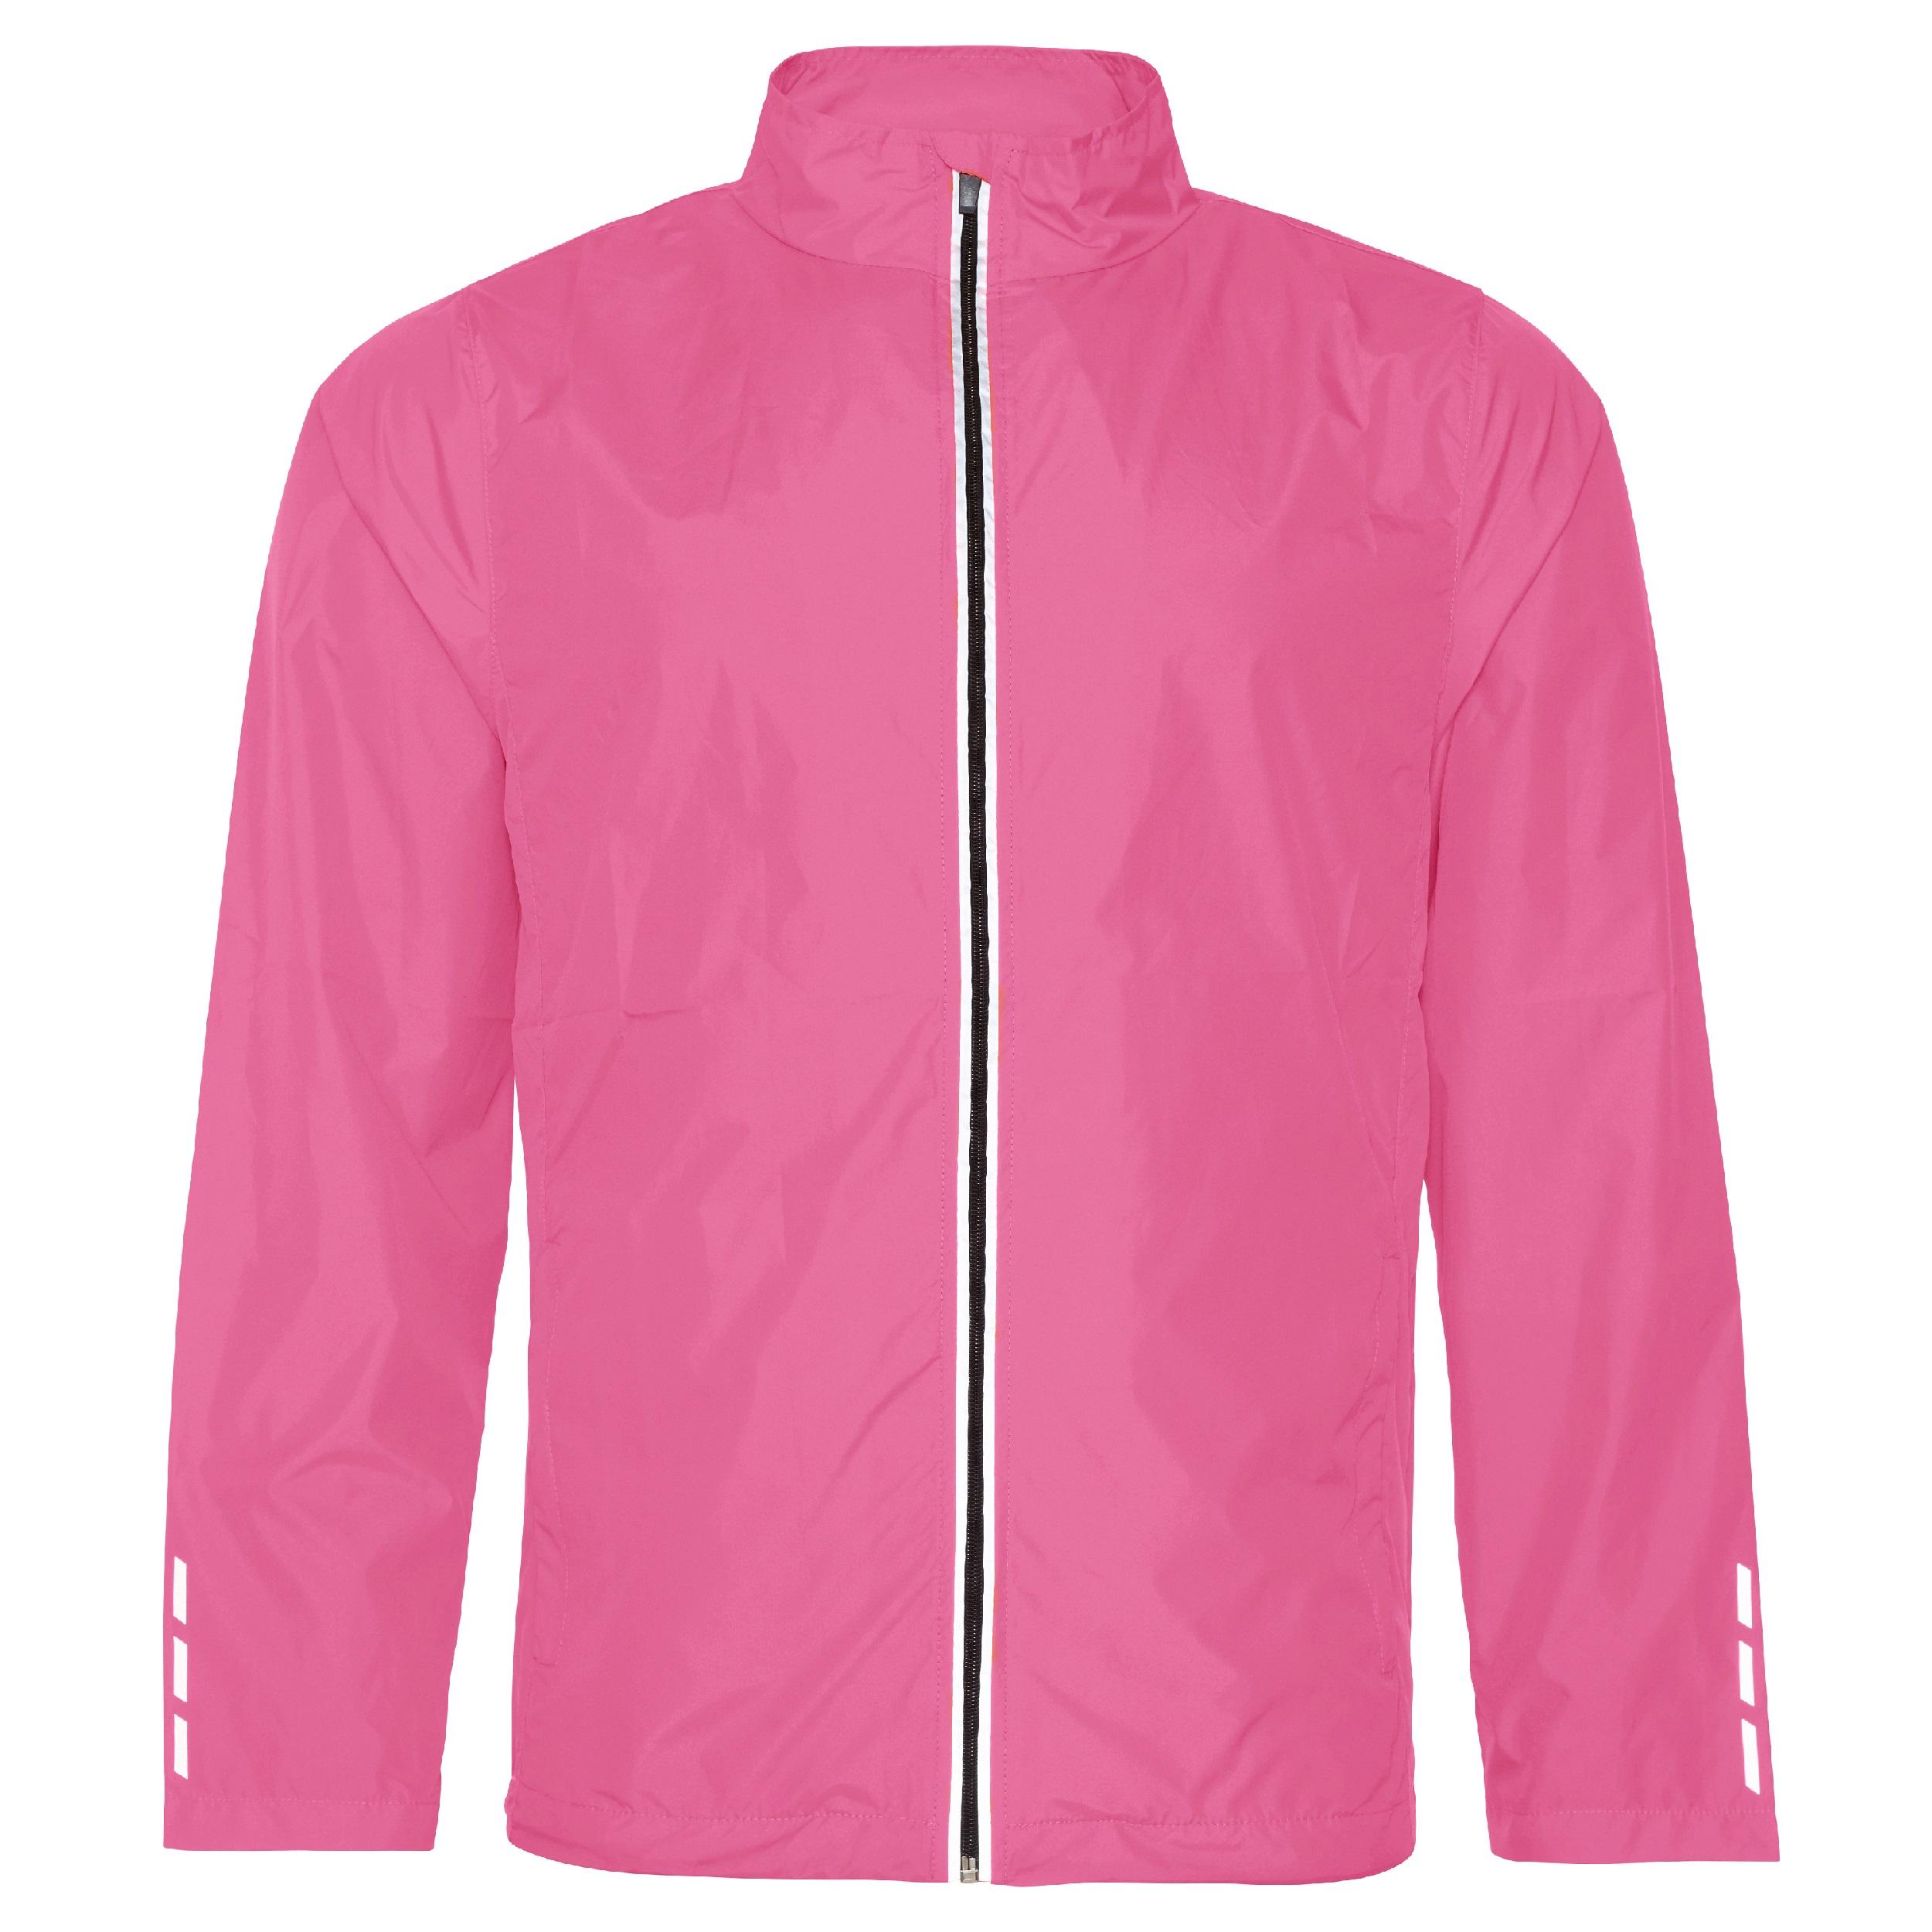 Juoksijan takki Cool, Electric Pink